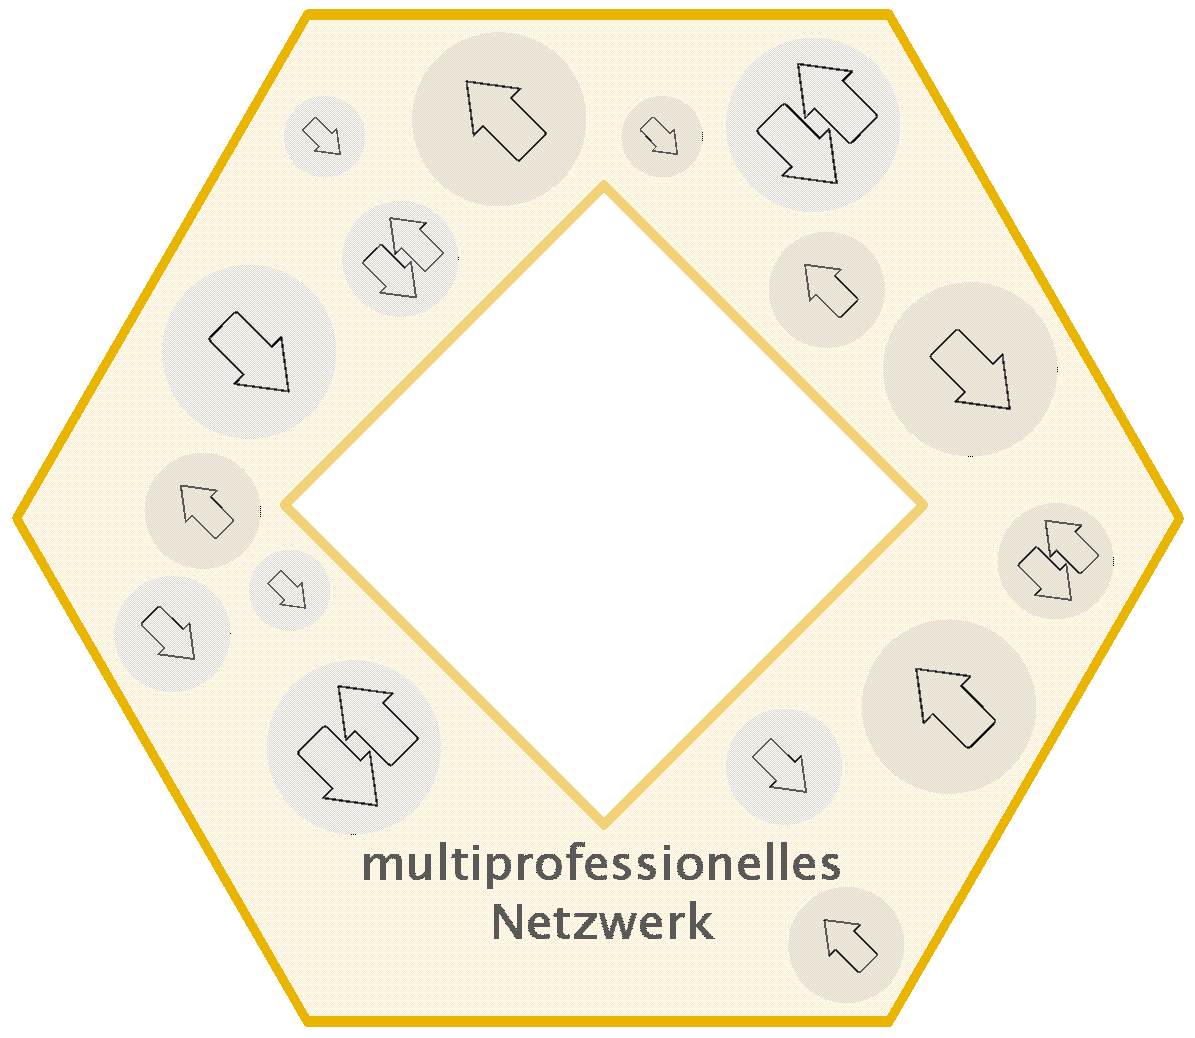 Grafik: Kernelement Multiprofessionelles Netzwerk